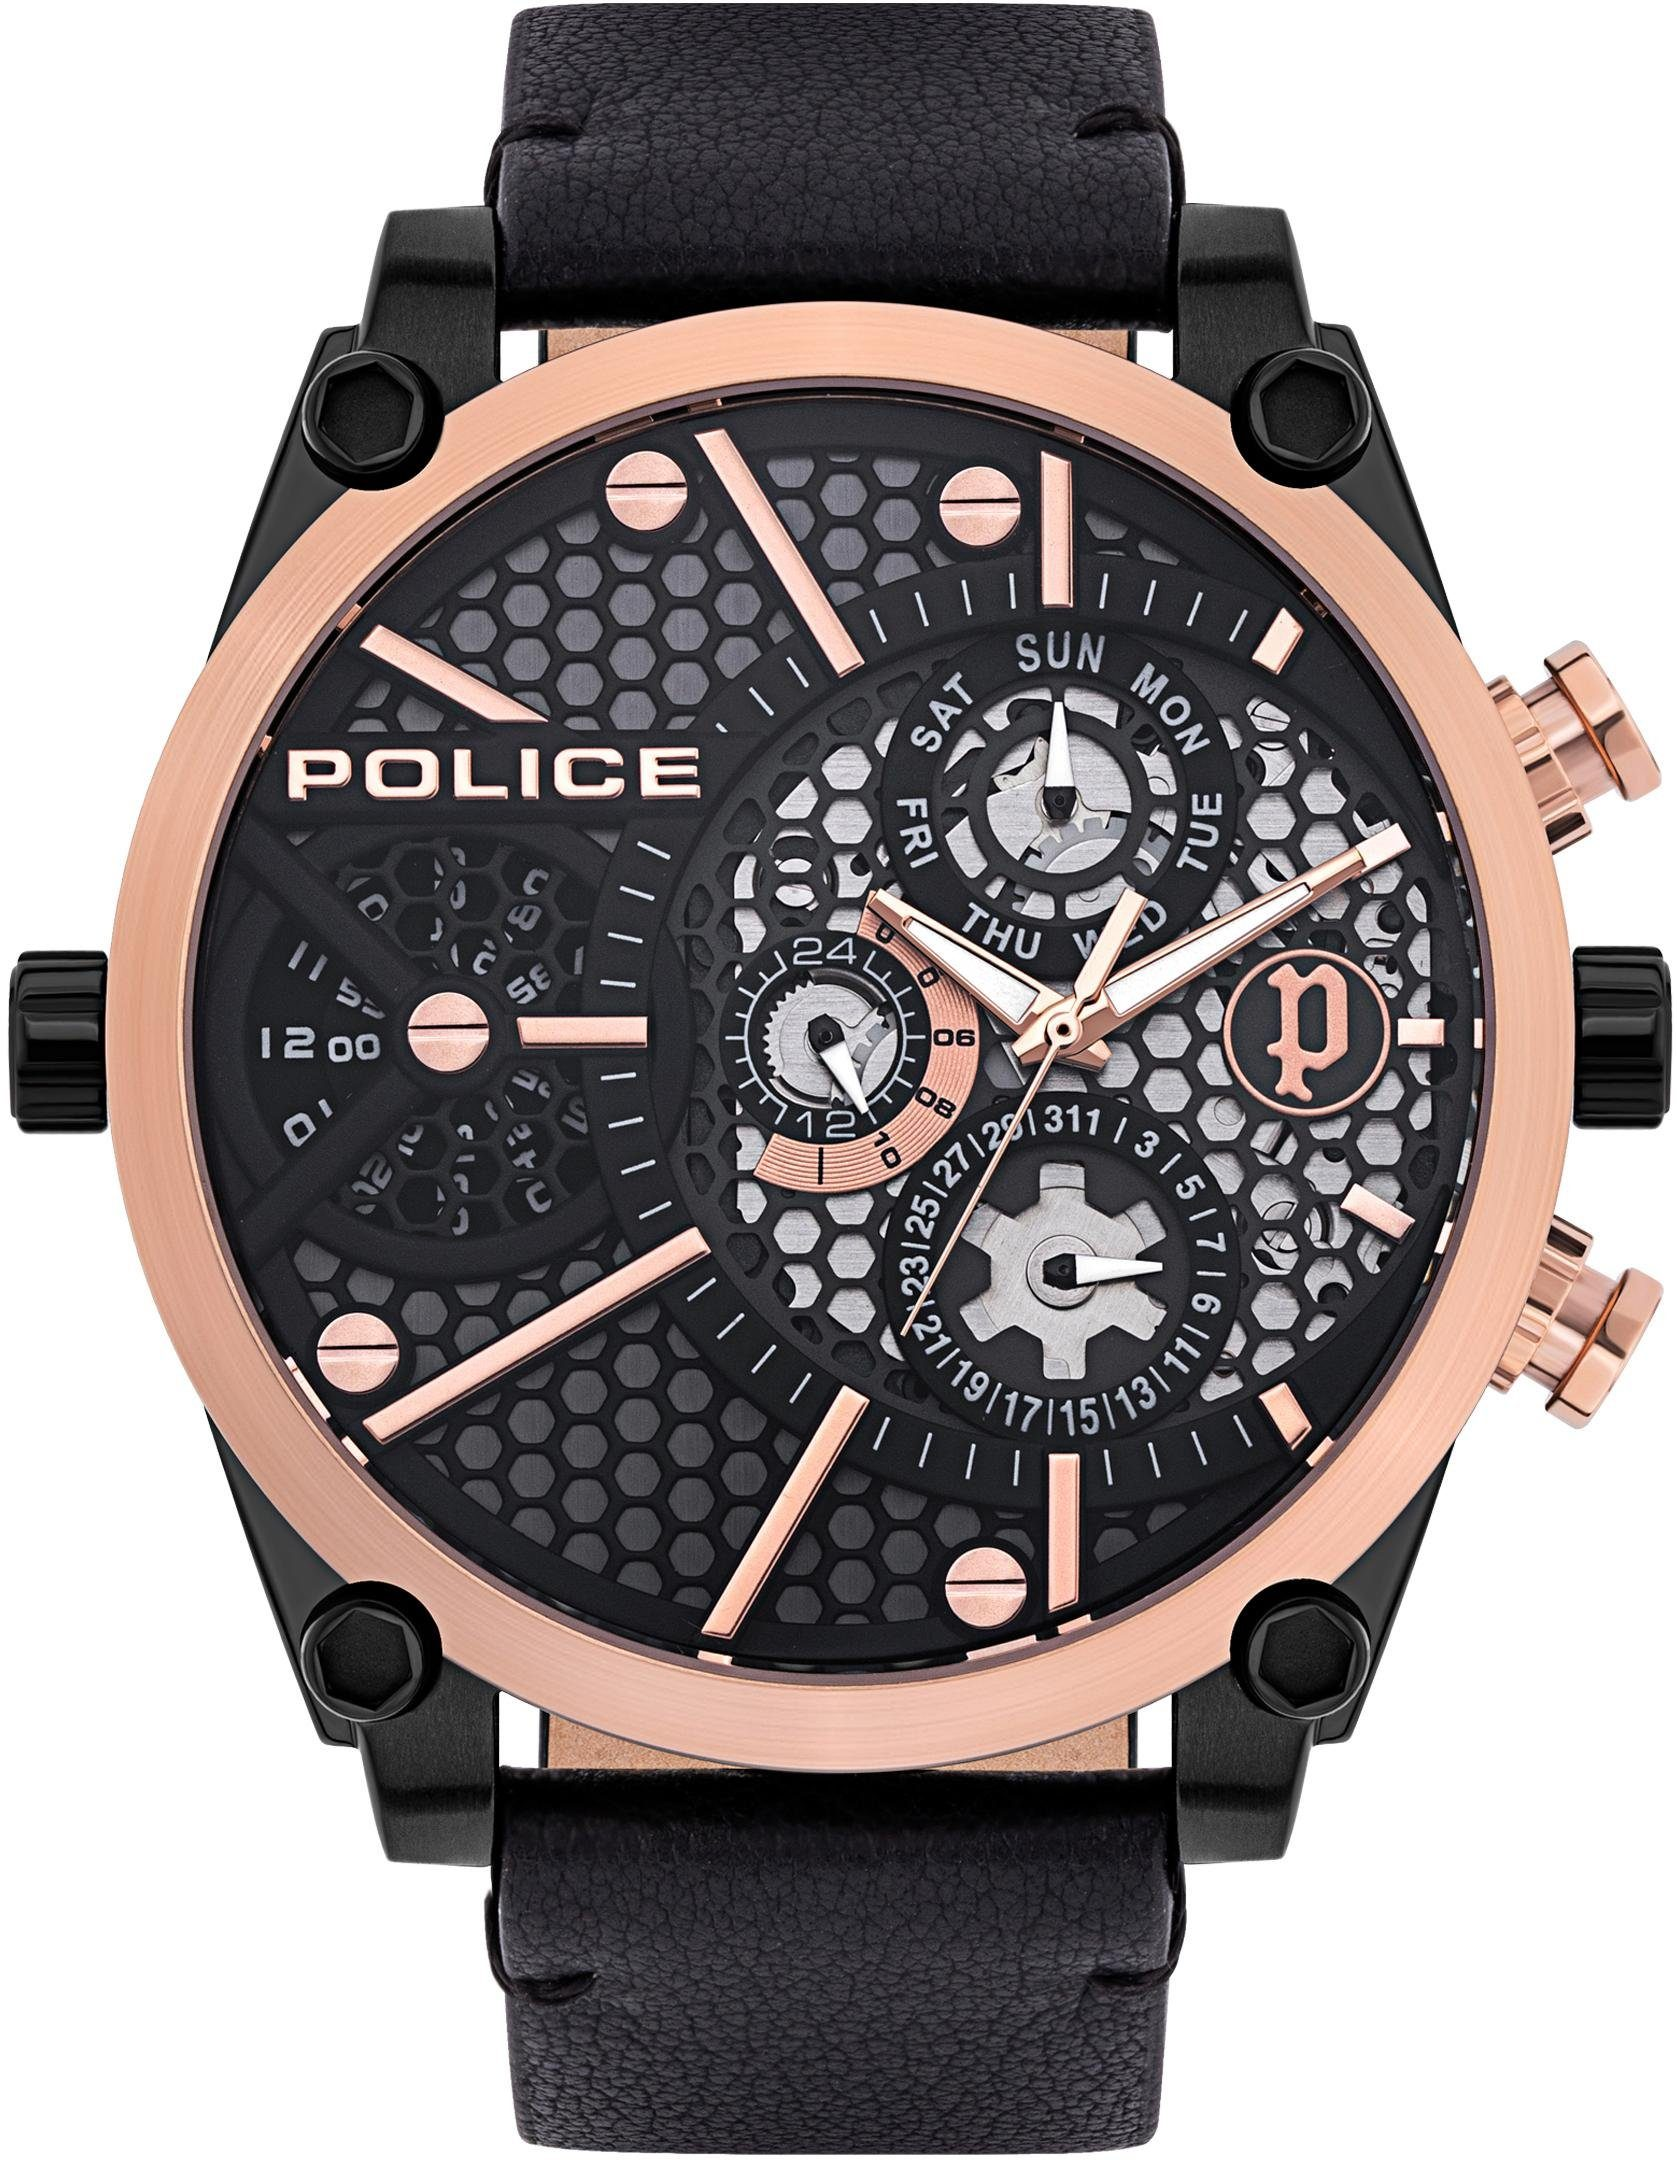 Police Quarzuhr VIGOR PL15381JSBR61   Uhren > Quarzuhren   Schwarz   Police